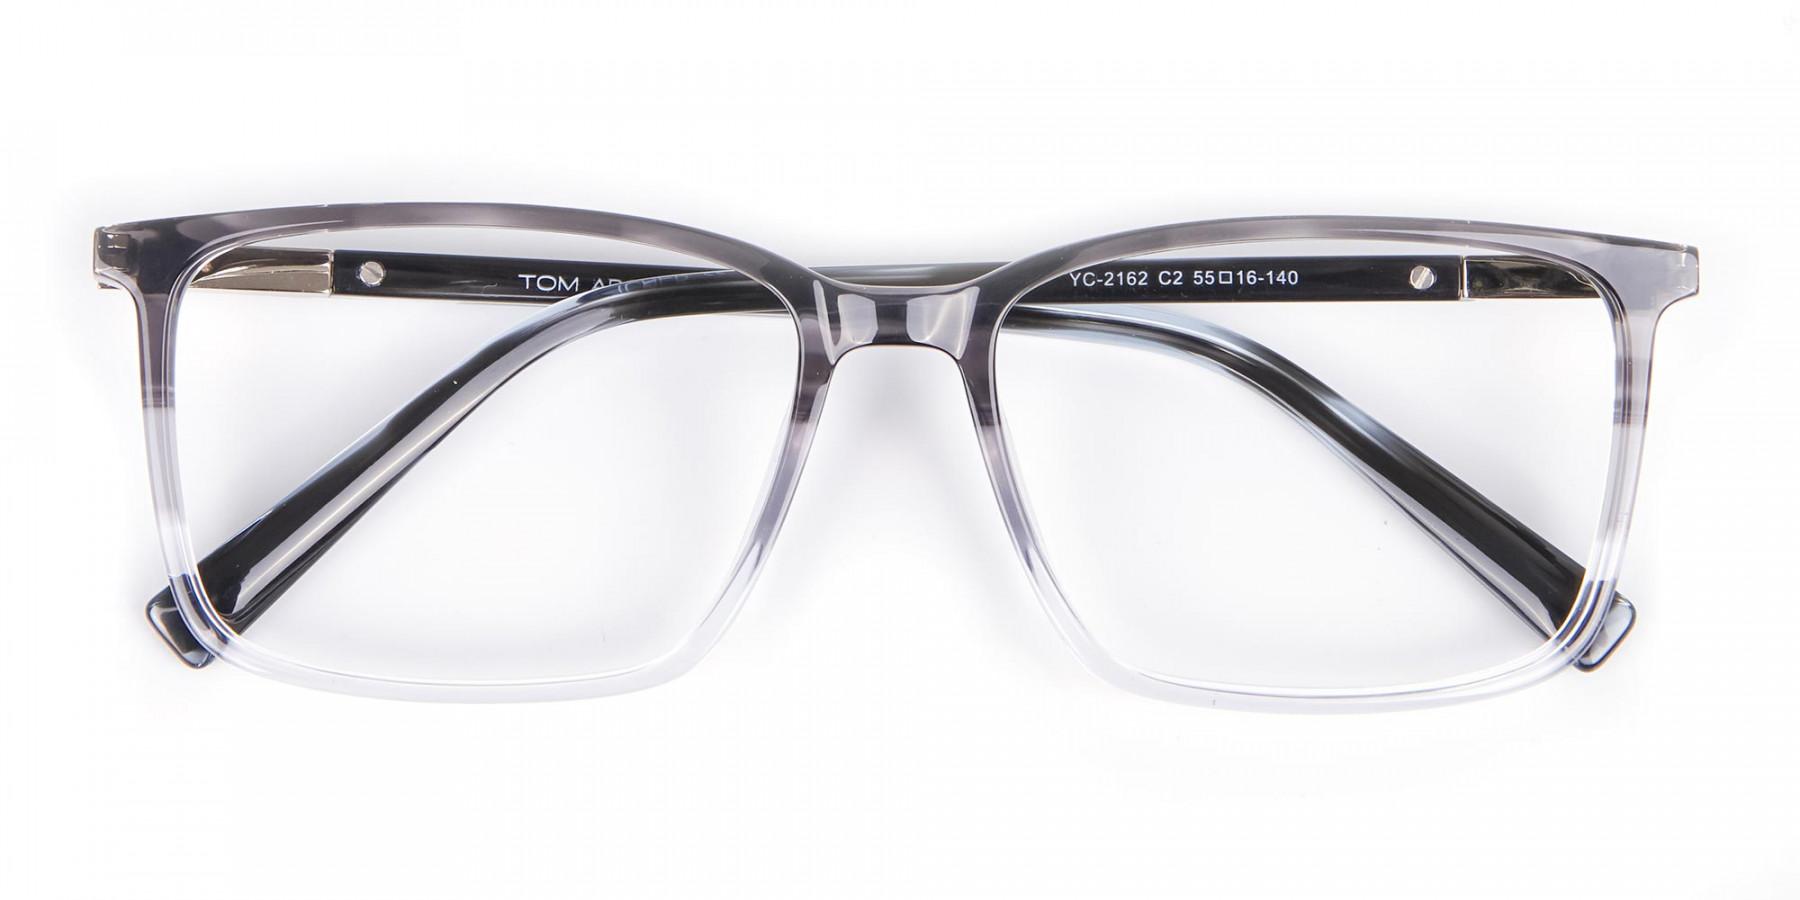 Latest Design Rectangular Frame in Two-Tone Grey - 1